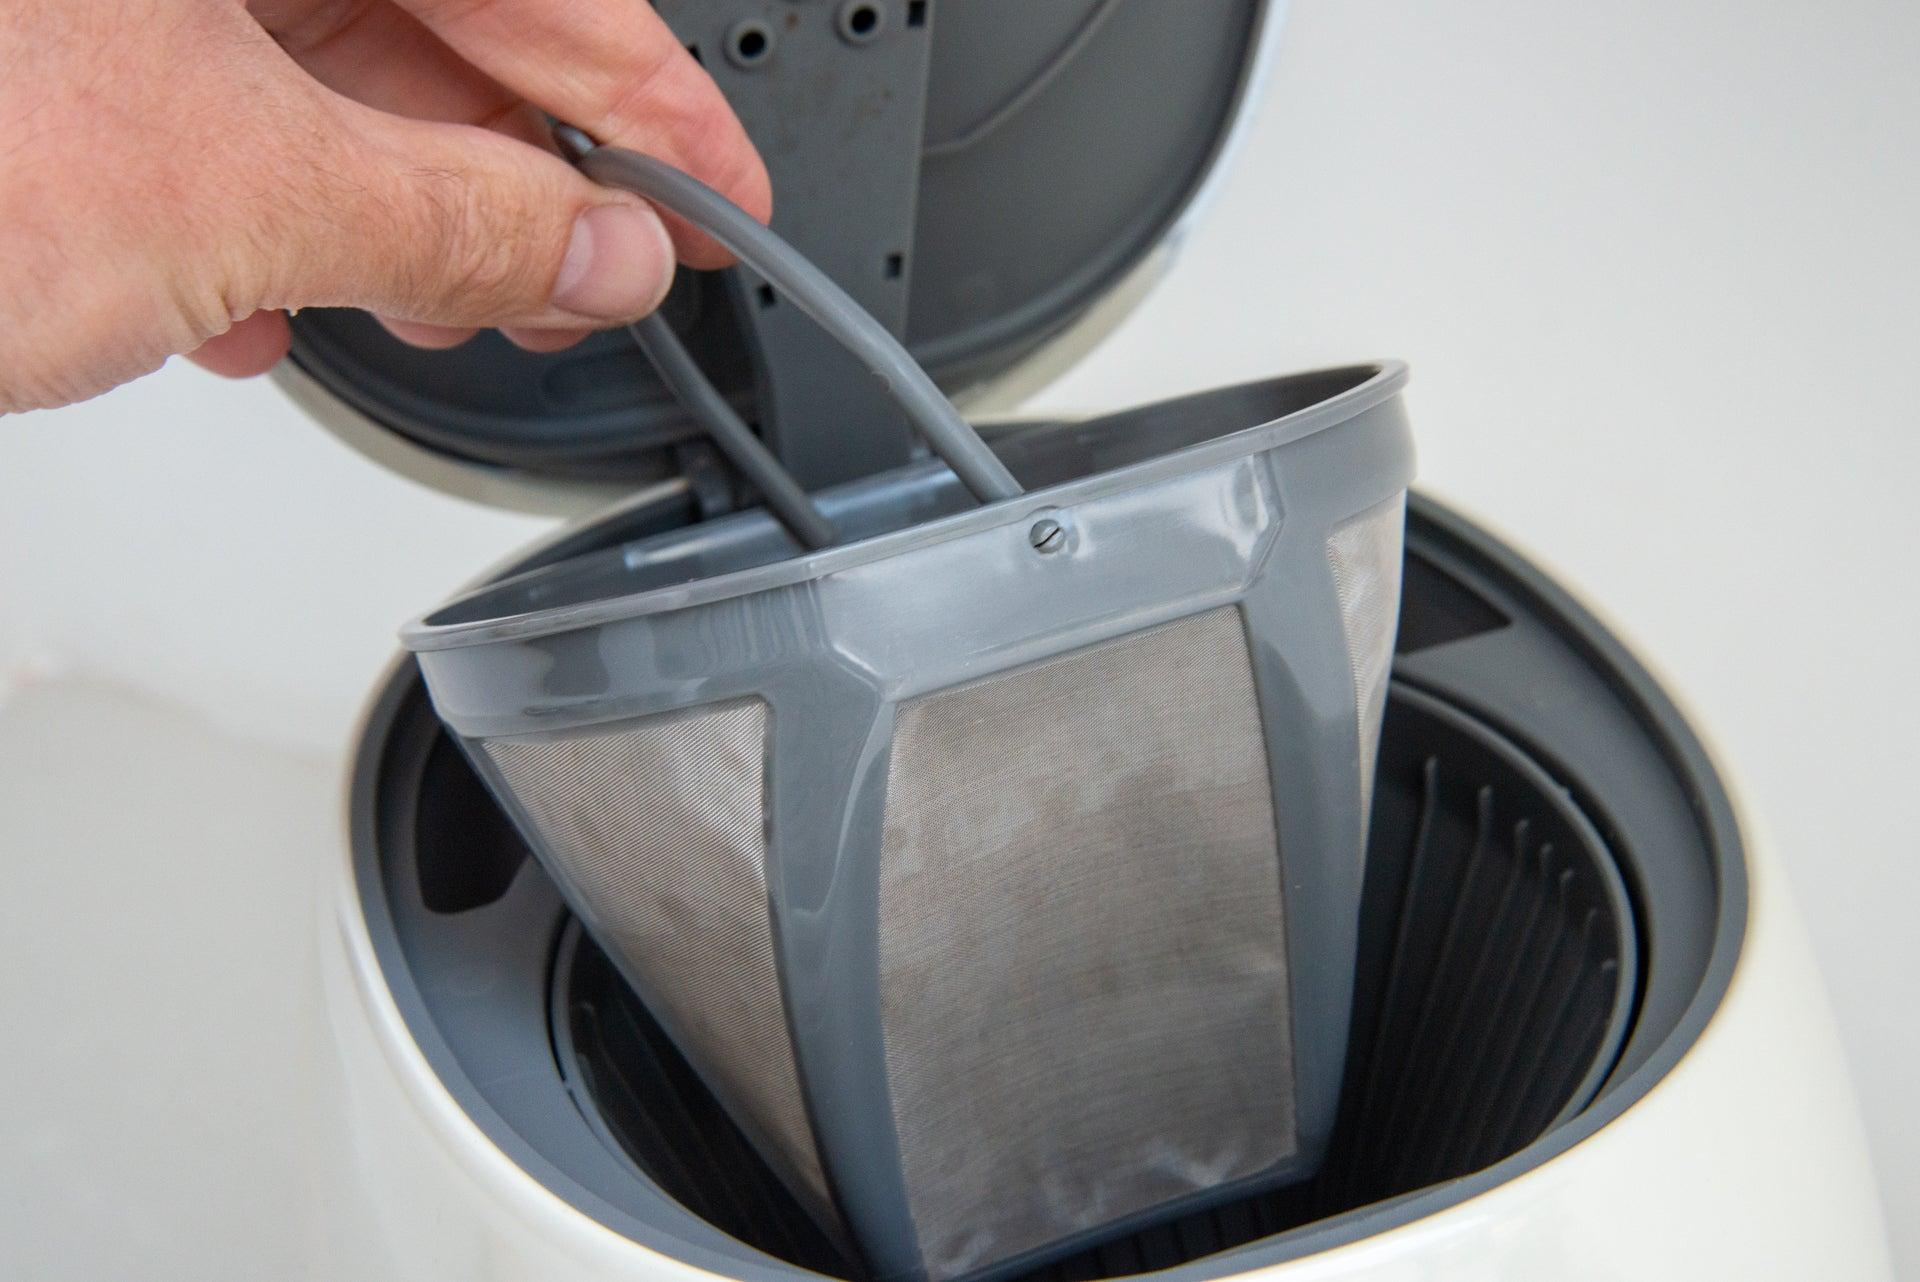 Smeg DCF02 Drip Filter Coffee Machine filter